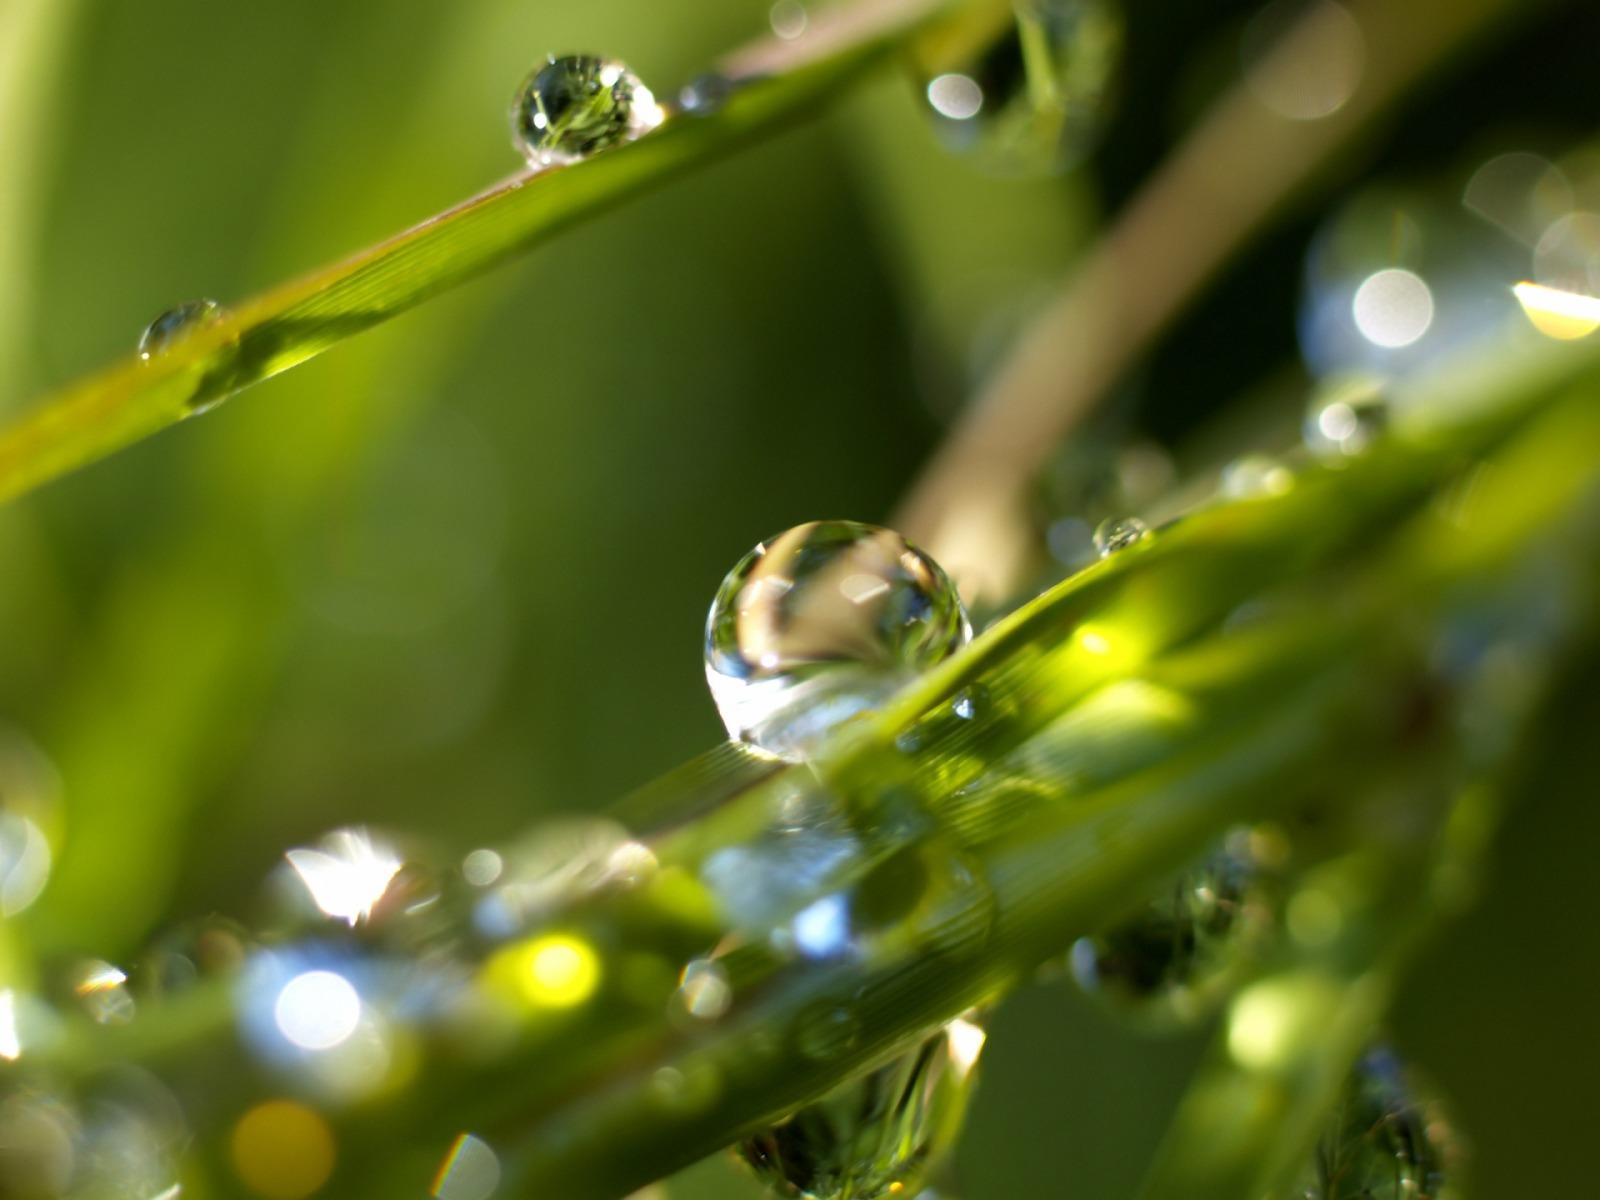 http://4.bp.blogspot.com/-MJKkMiyTfJQ/Tc-Yblo5-OI/AAAAAAAAI-U/jjtkpC-hVvg/s1600/rain_drops_wallpaper_plants_nature_wallpaper_1600_1200_1663.jpg